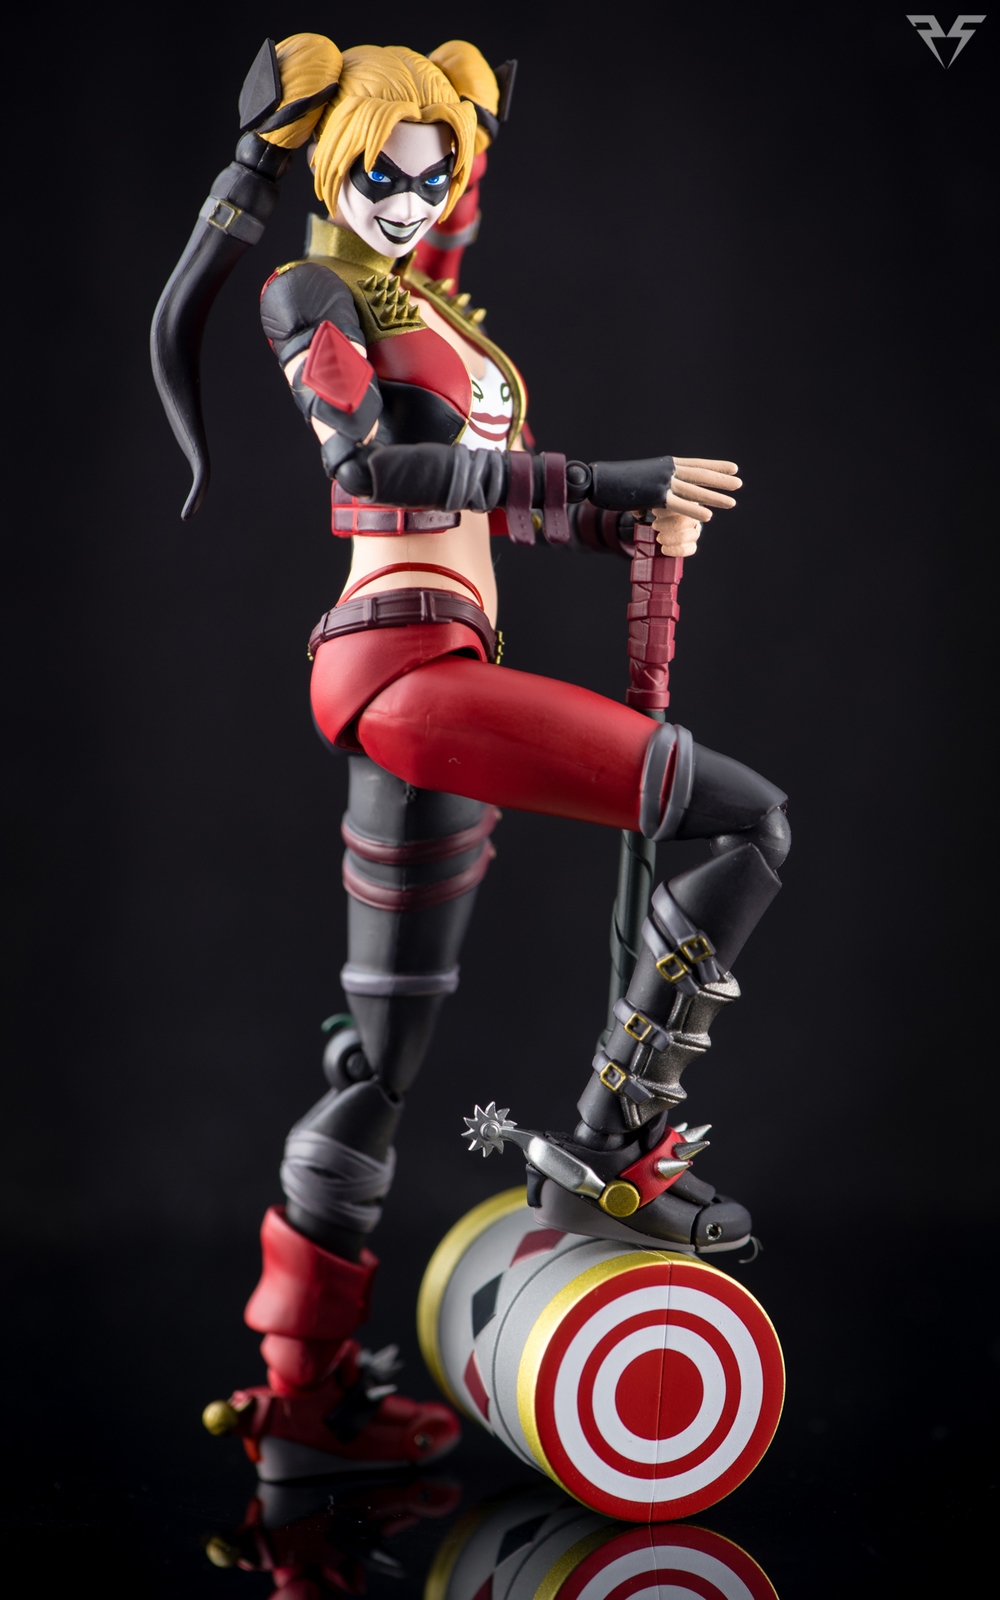 Figuarts Harley Quinn-14.jpg